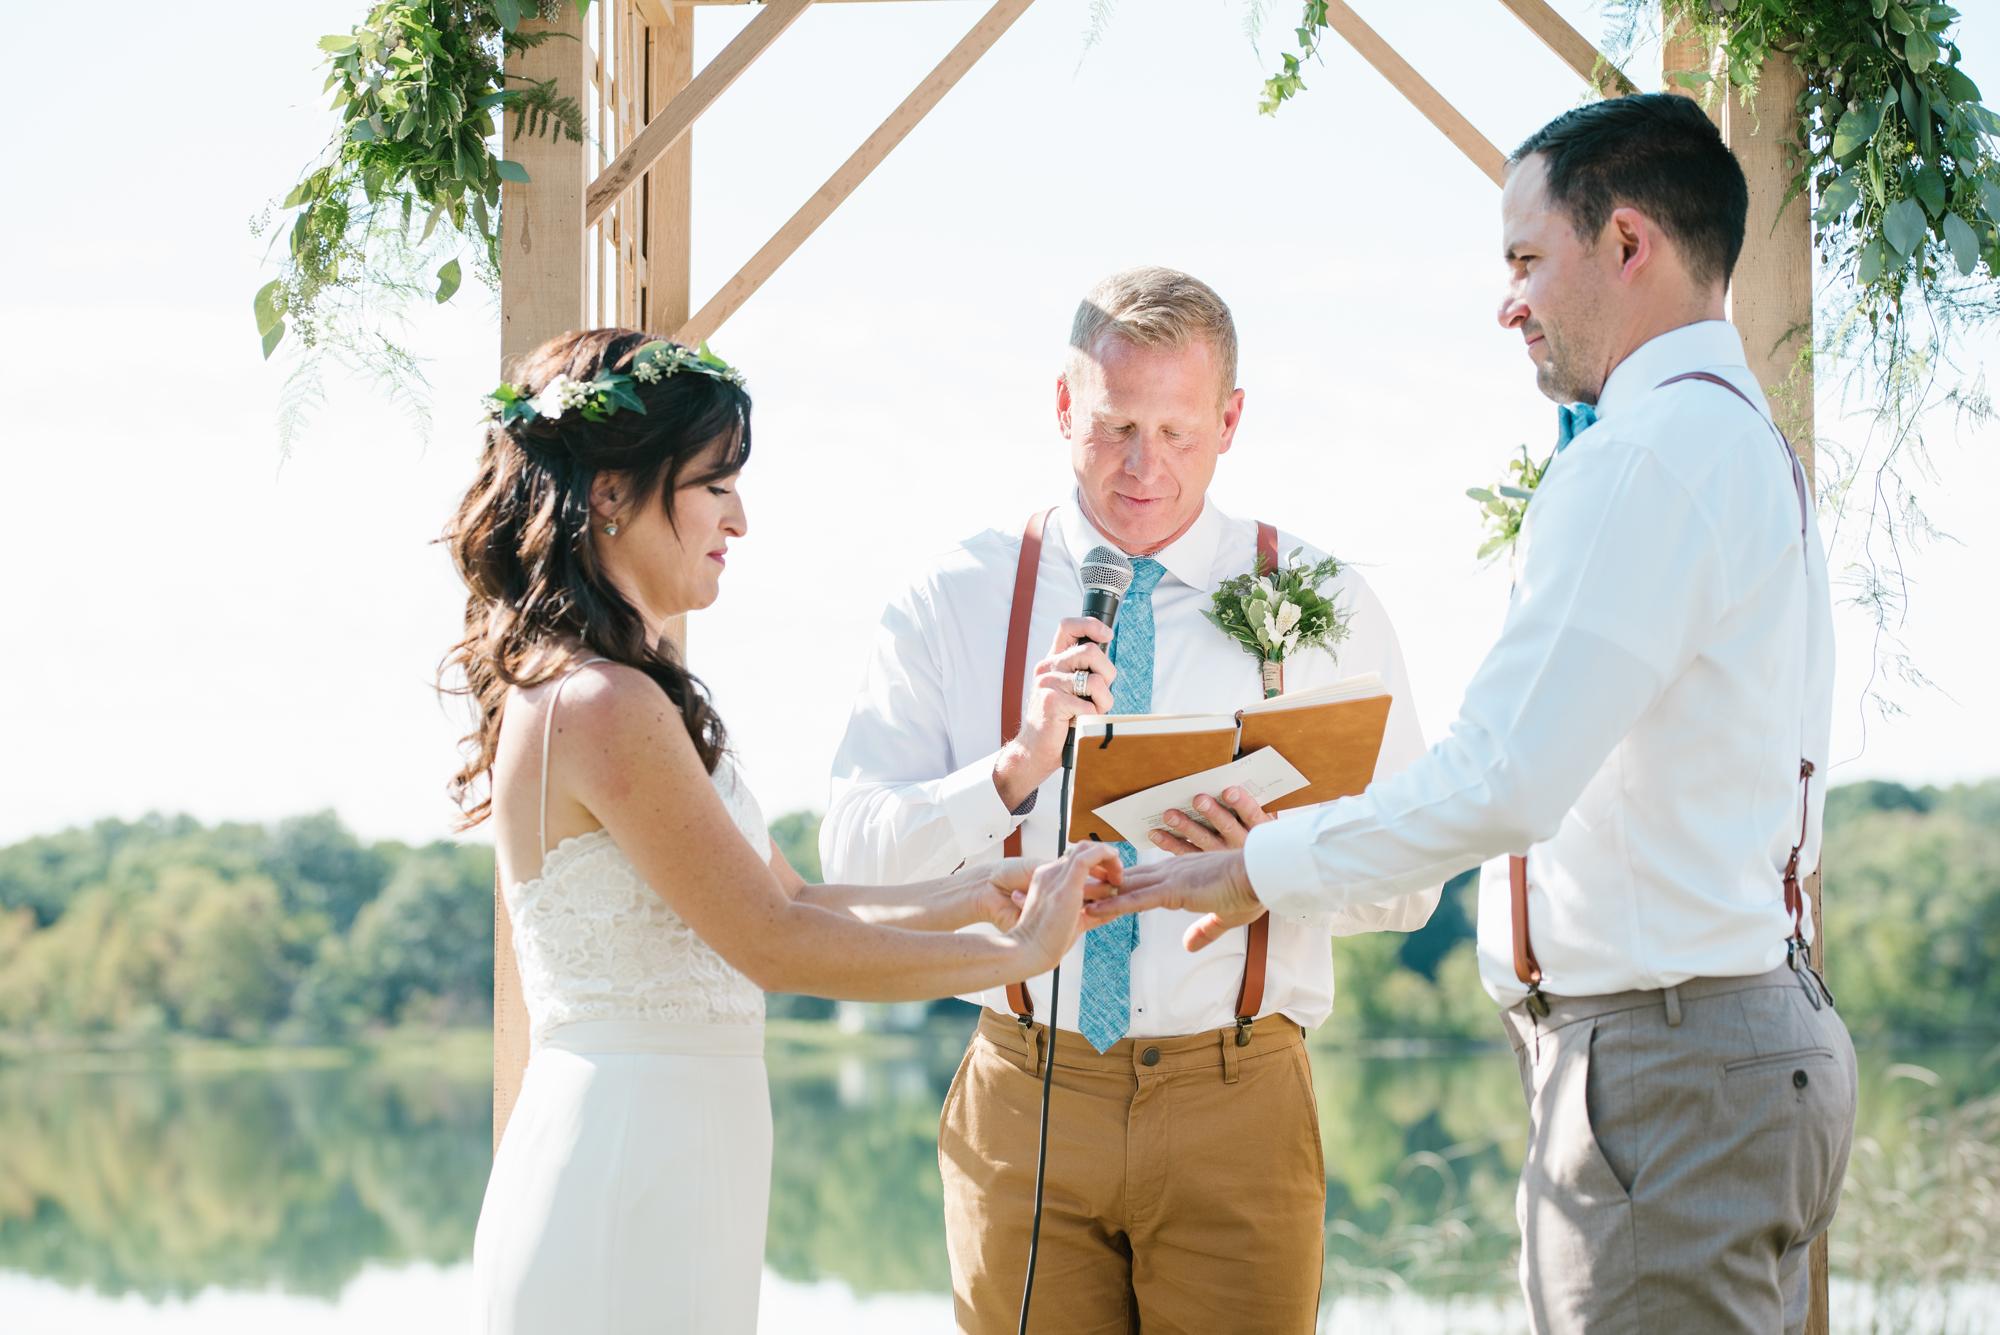 Quincy-Coldwater-Michigan-farm-wedding-photogapher-sydney-marie (188).jpg